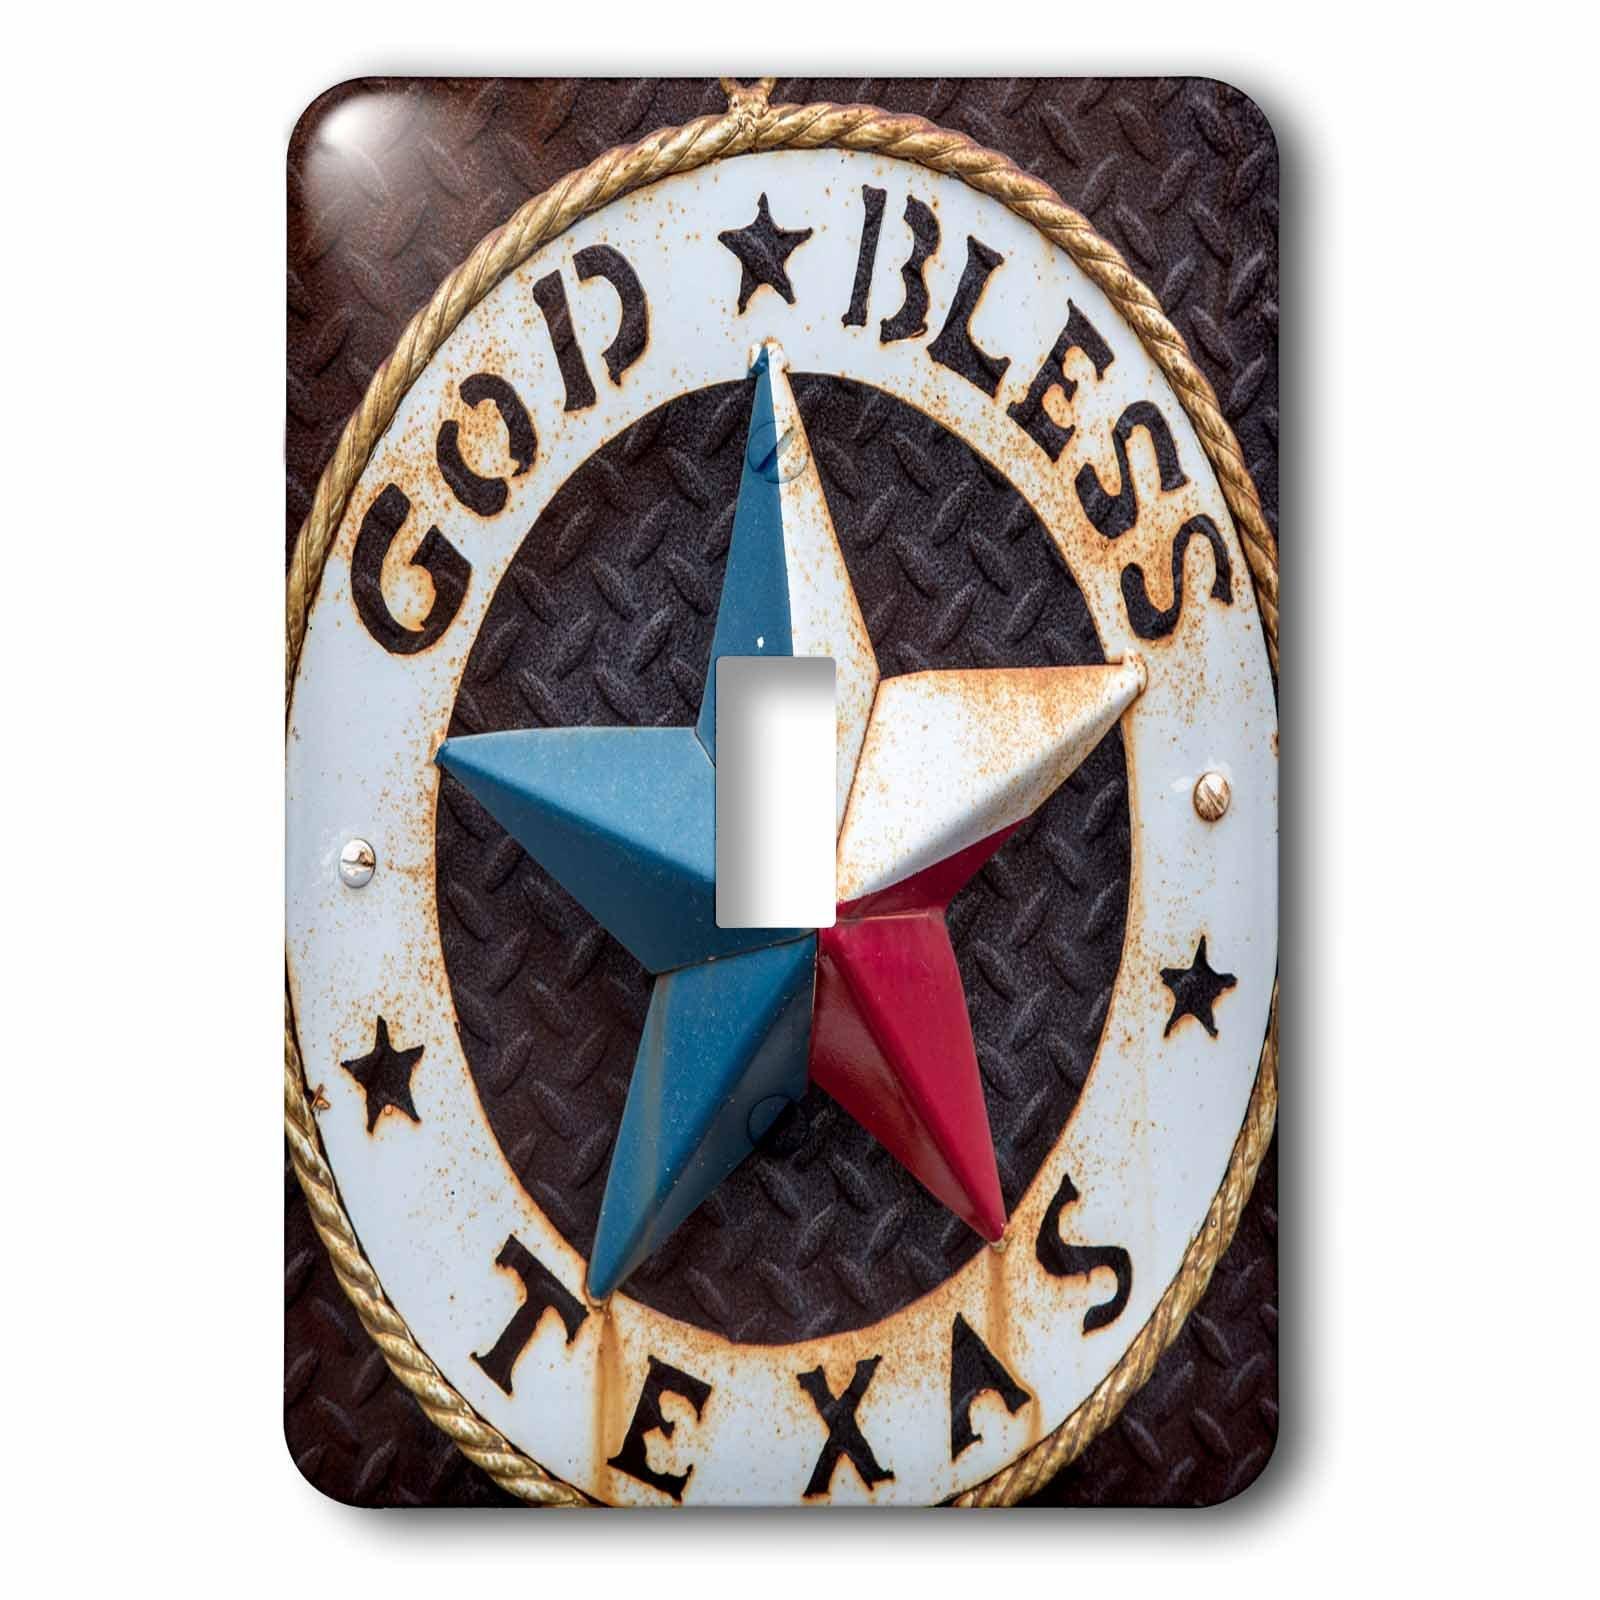 3dRose lsp_190191_1 Lone Star Of Texas Emblem, Austin, Texas, Usa Toggle Switch